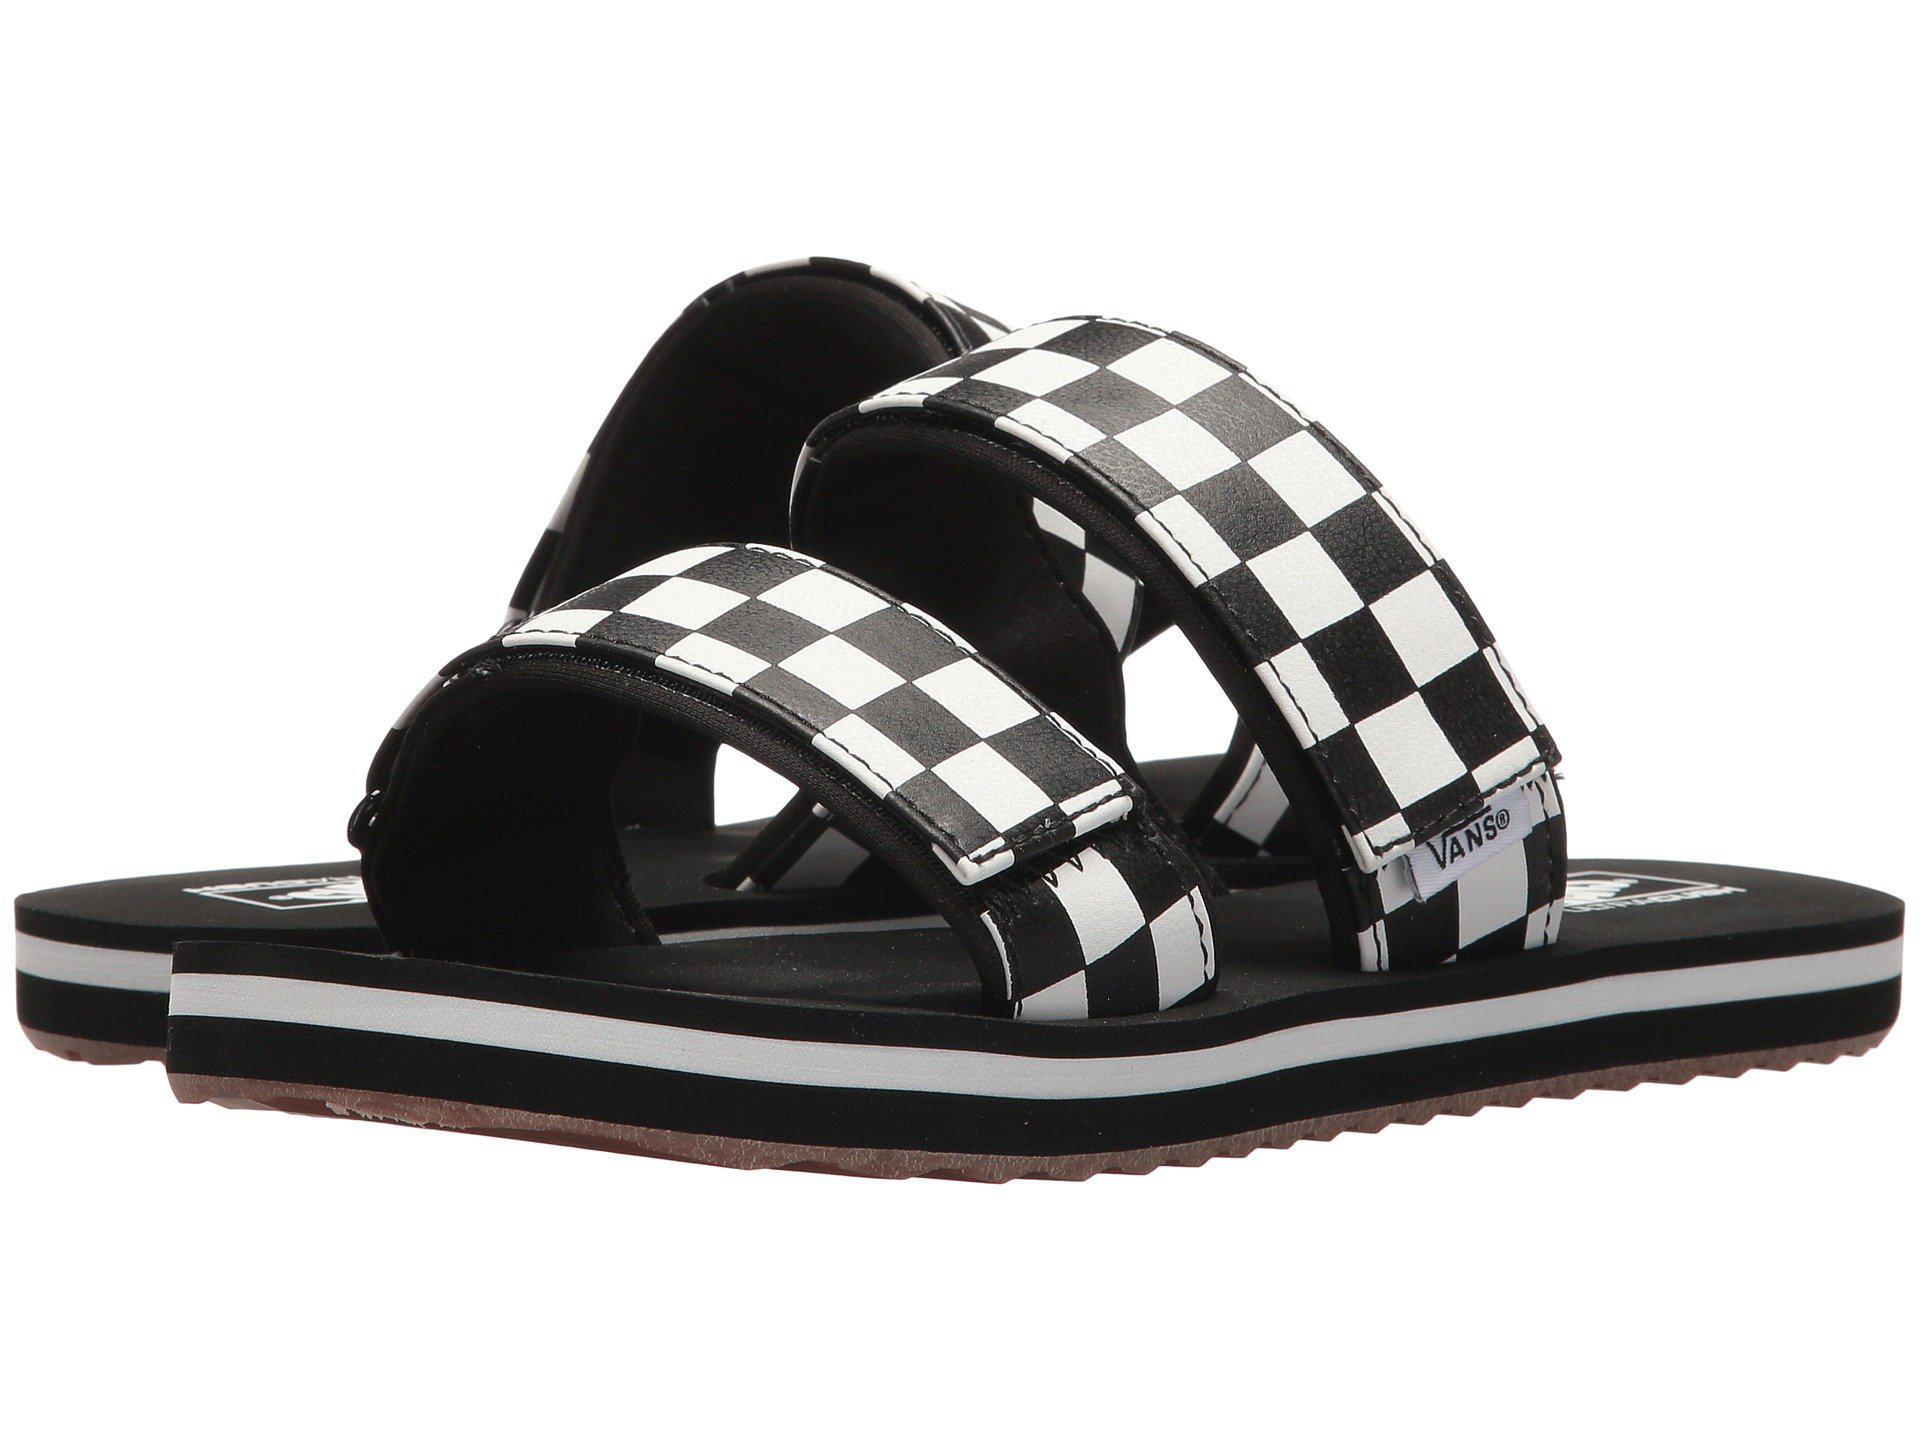 198f35f821d6 Lyst - Vans Cayucas Slide in Black